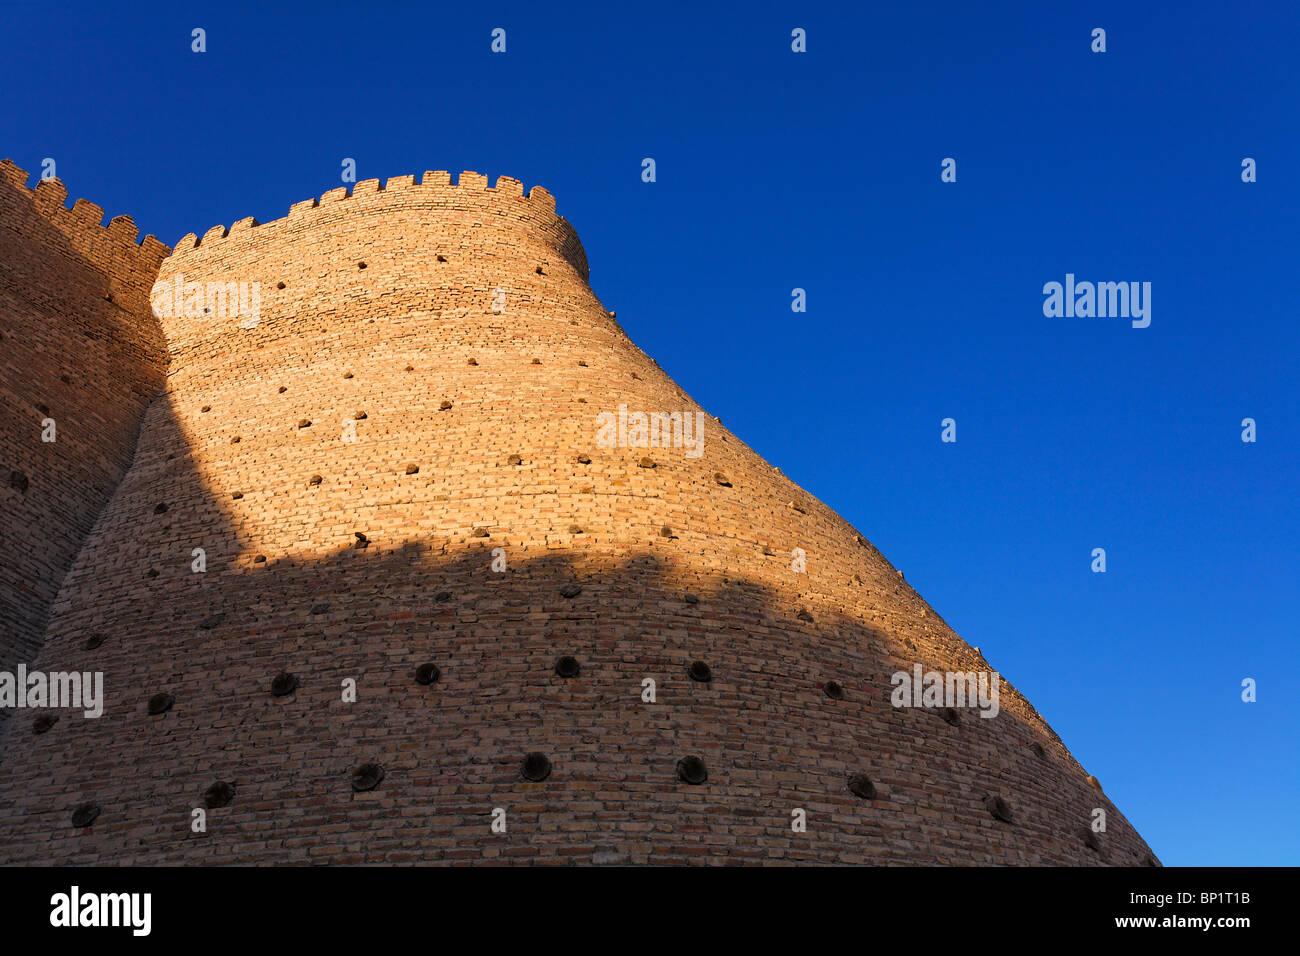 Uzbekistan - Bokhara - the walls of the Ark - Stock Image